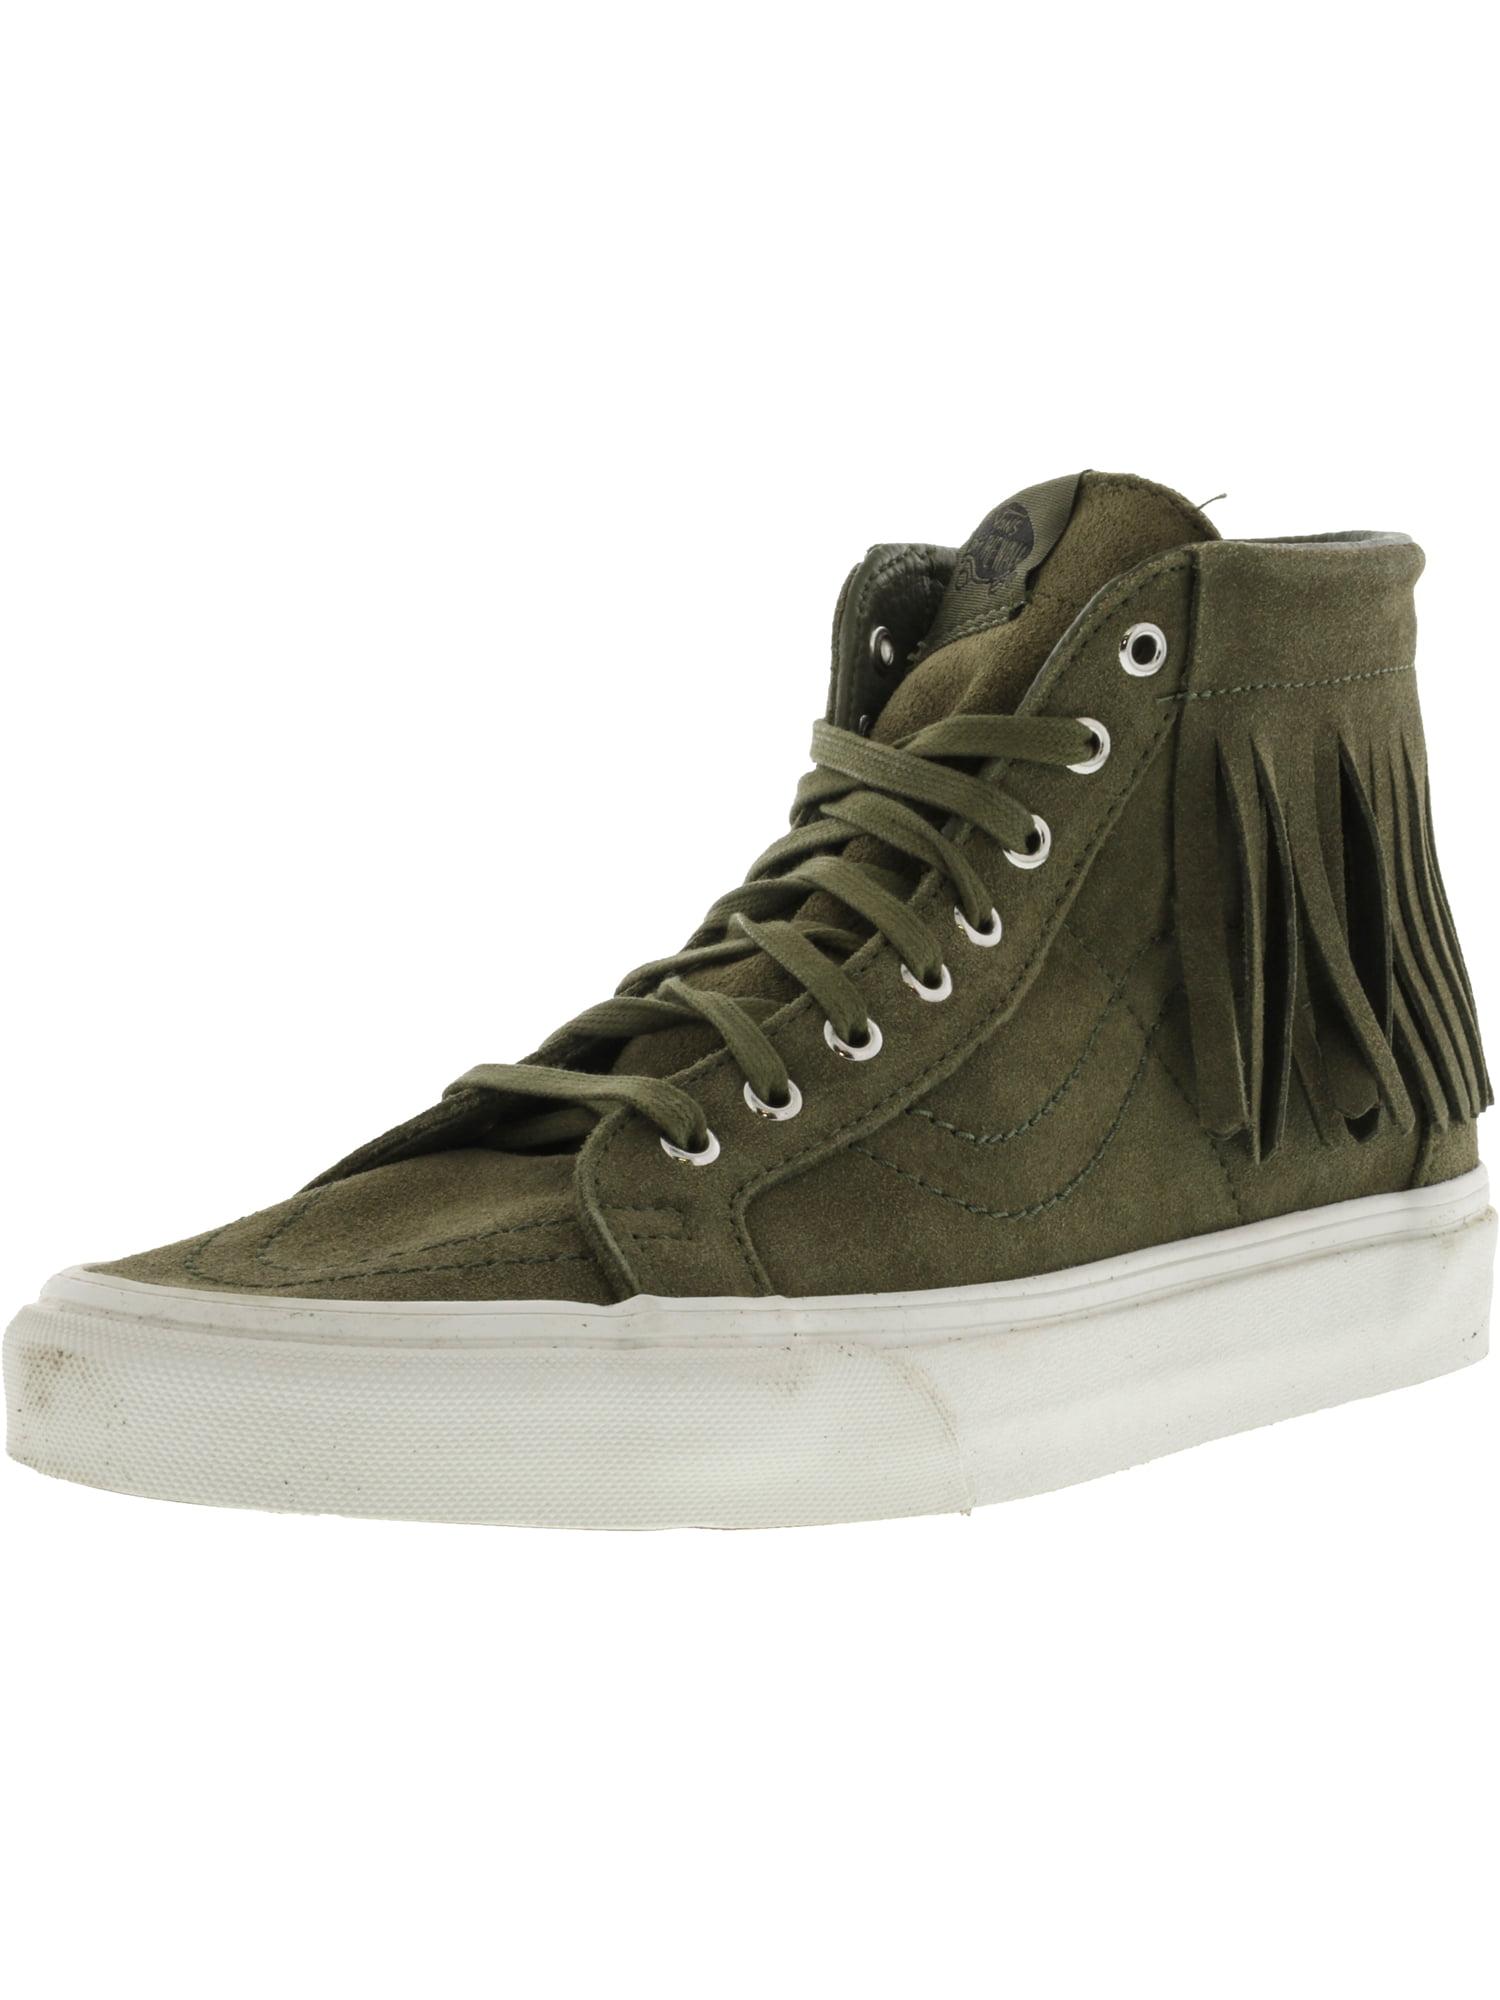 Vans Sk8-Hi Moc Suede Ivy Green / Blanc De Ankle-High Fashion Sneaker - 9M 7.5M